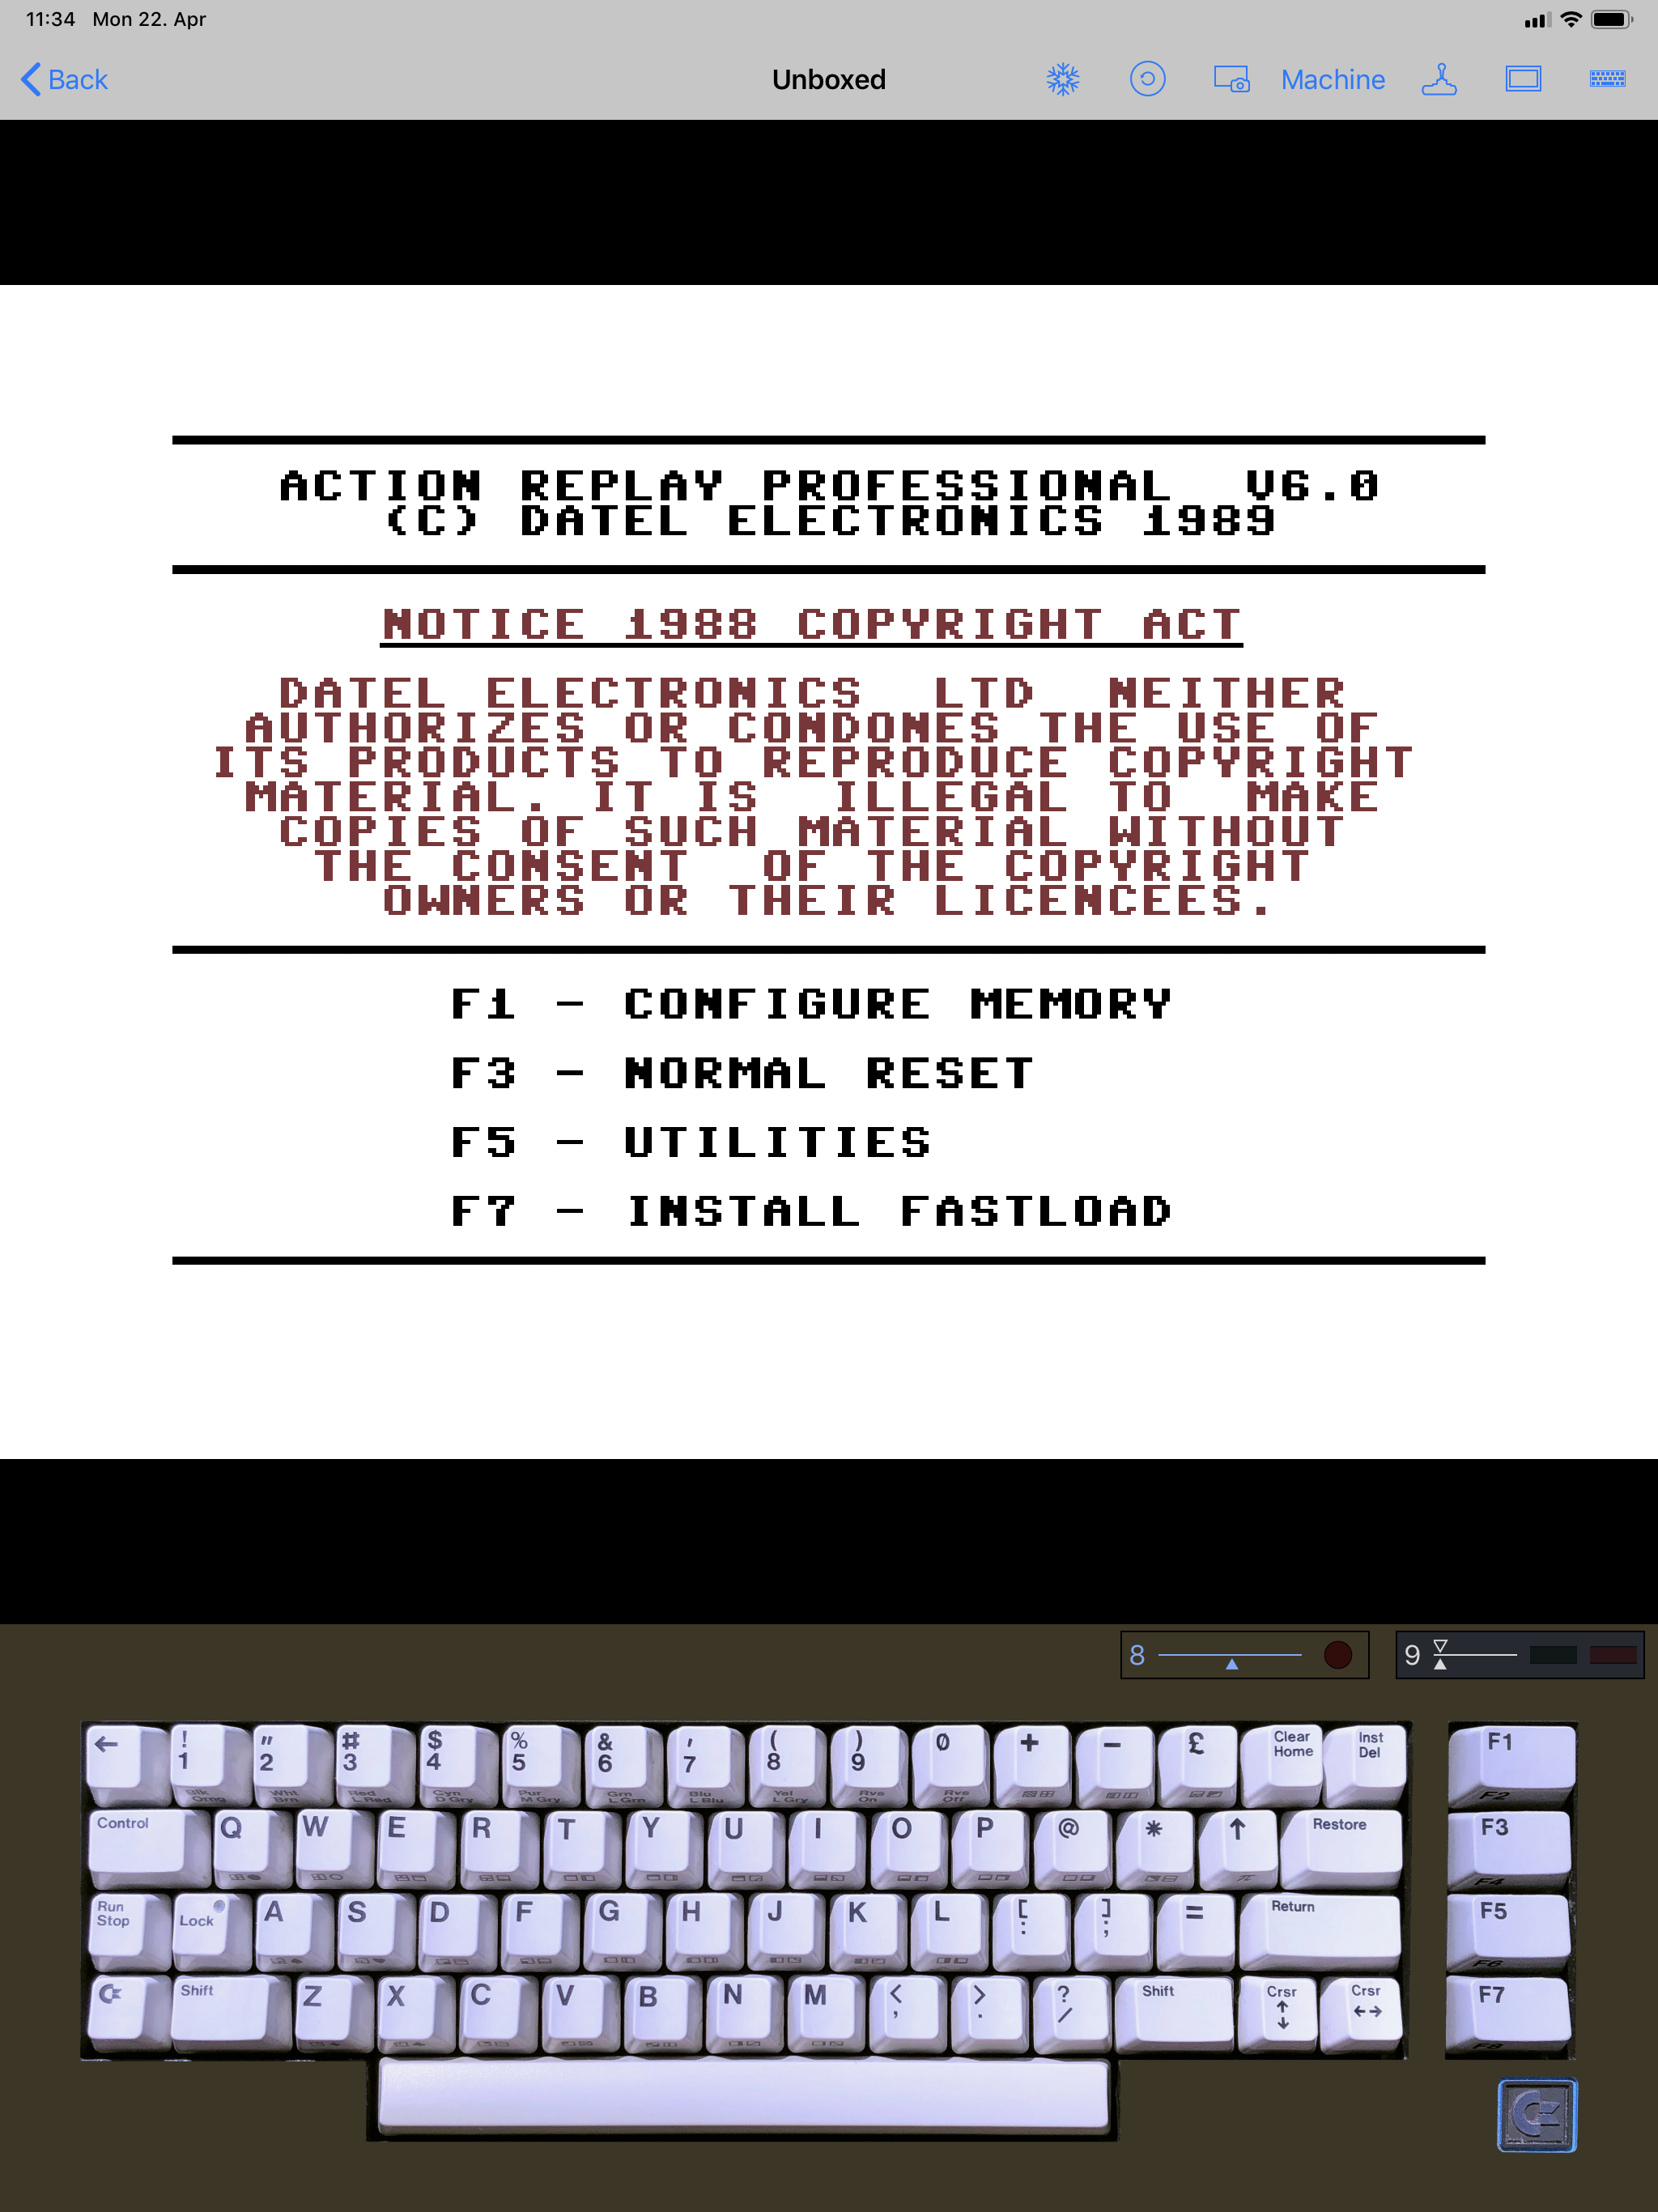 Vice Emulator Keyboard Shortcuts